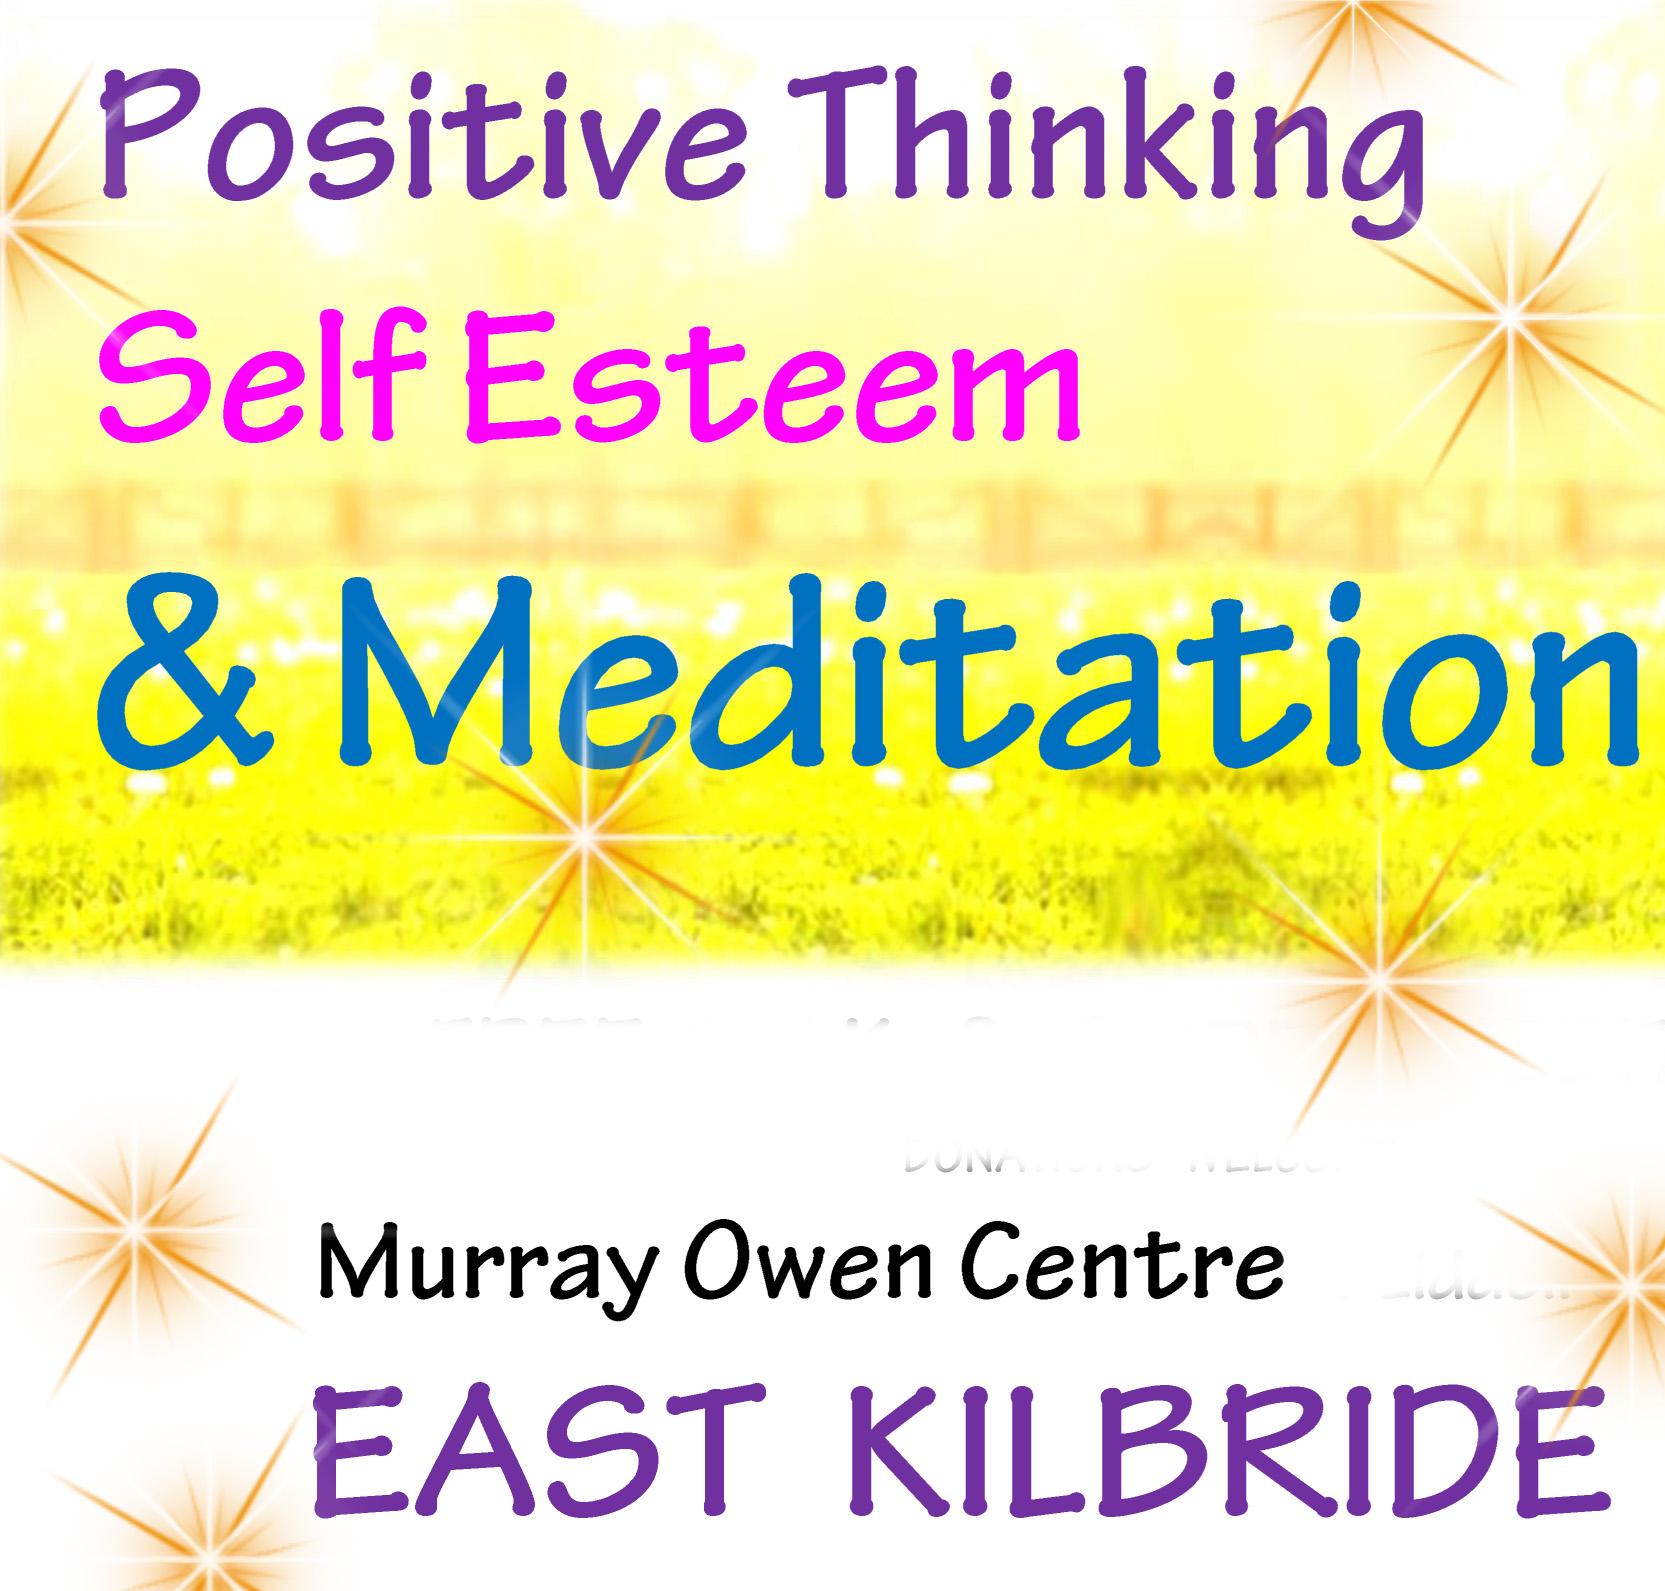 EAST KILBRIDE : Positive Thinking & Meditation